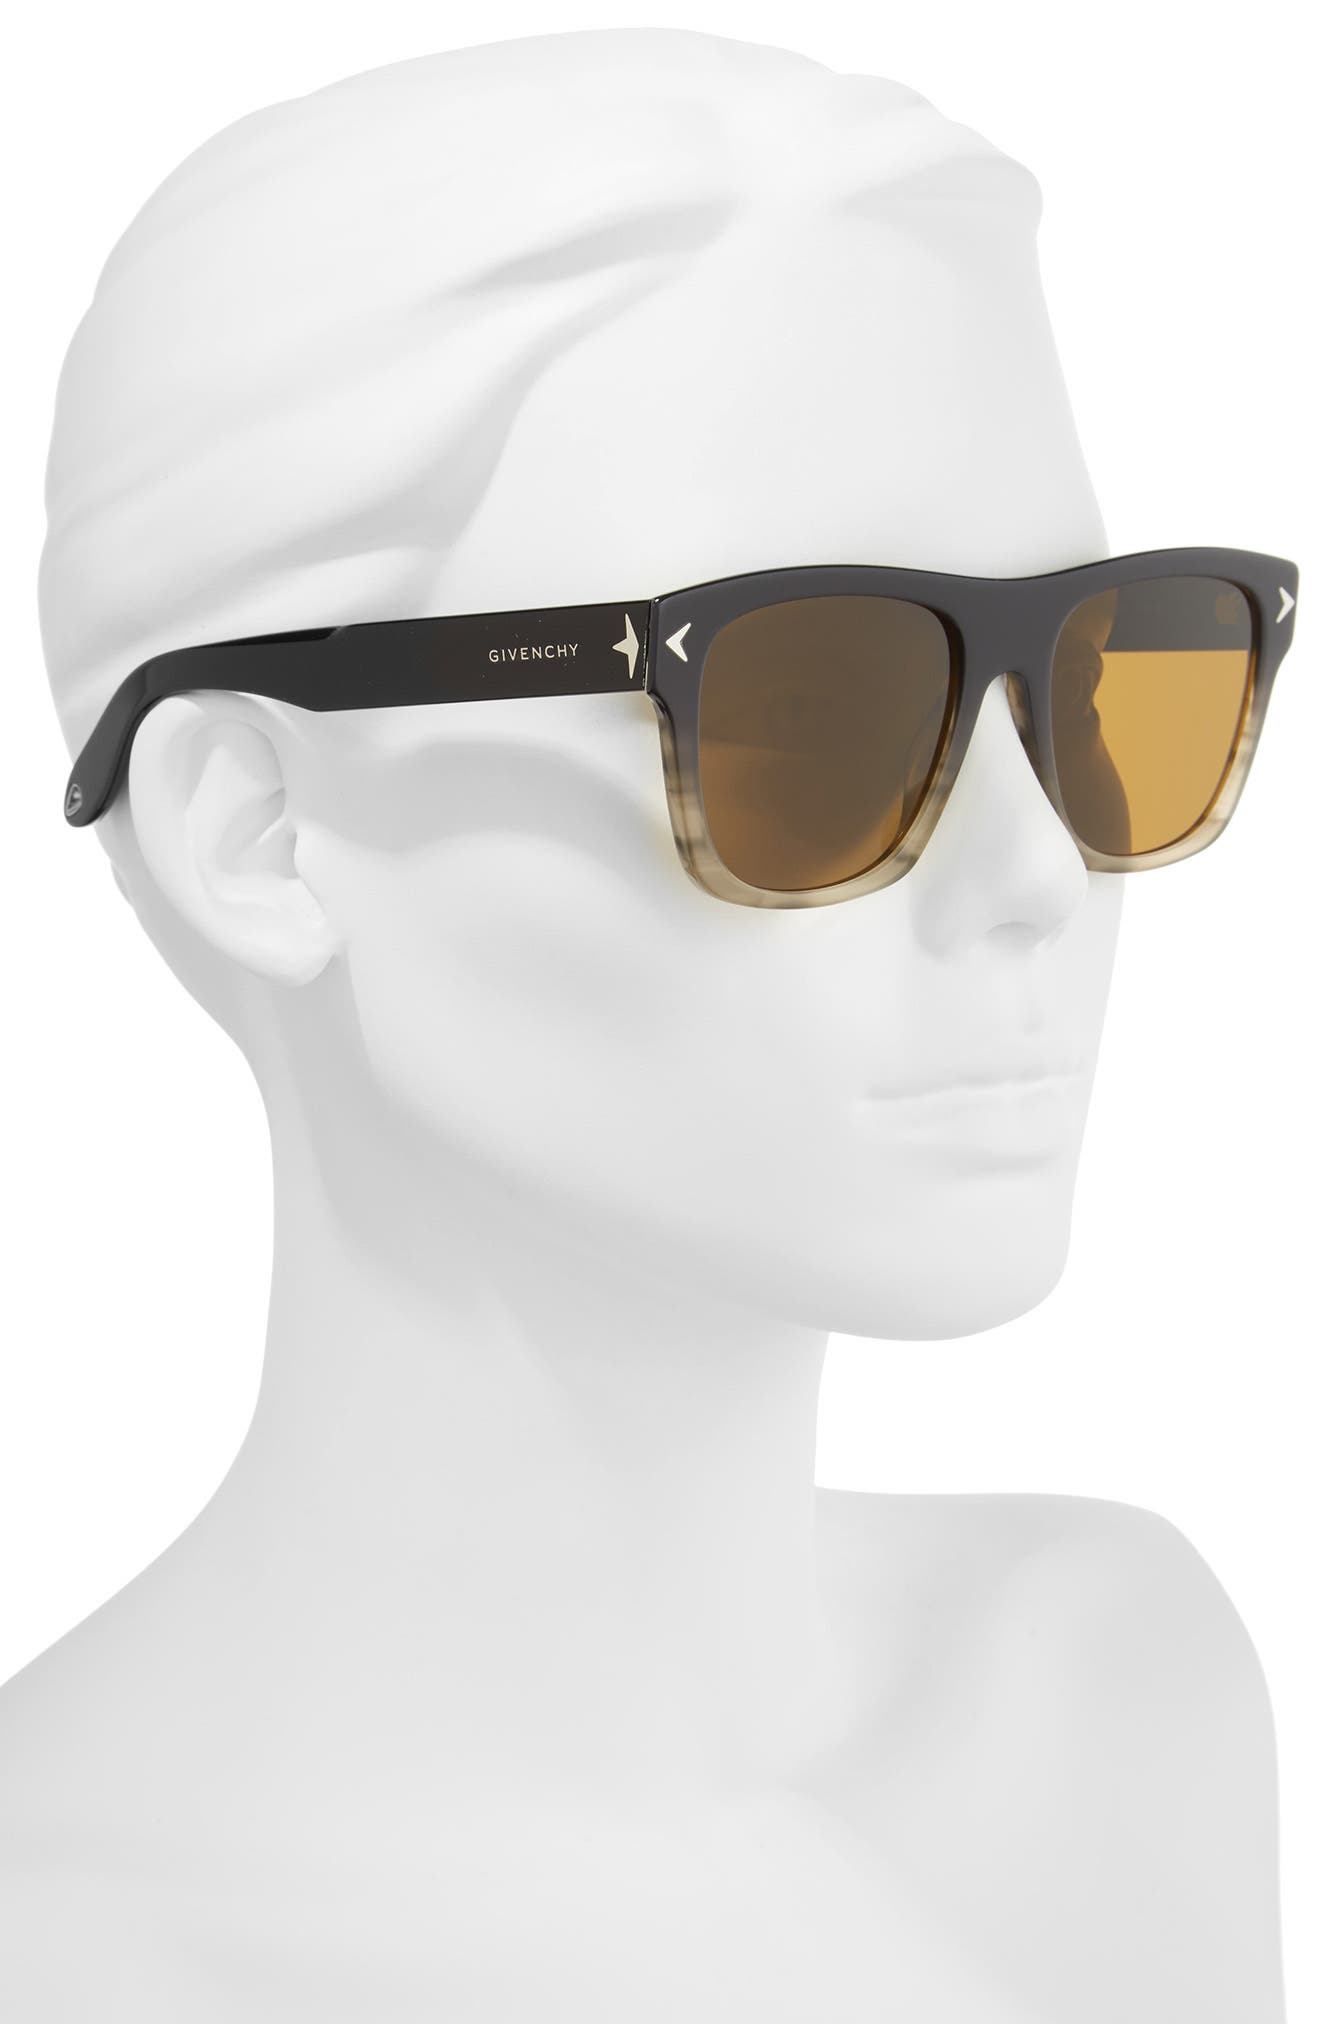 55mm Square Sunglasses,                             Alternate thumbnail 2, color,                             020